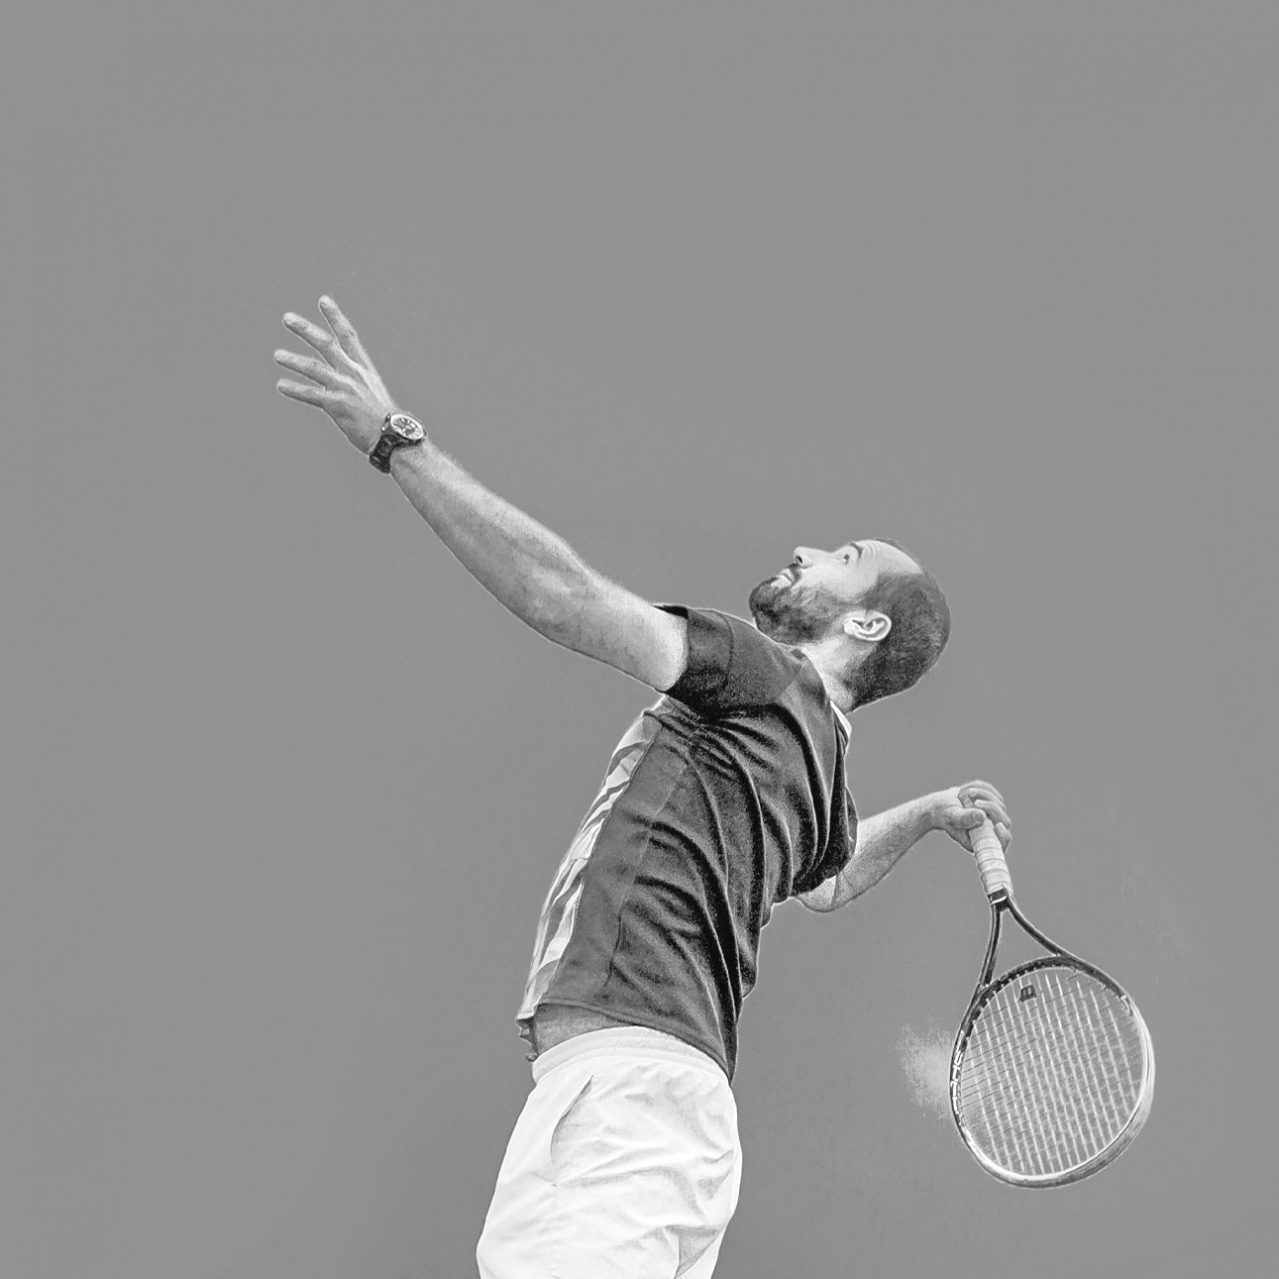 cennik-kortow-trener-tenisa-bw